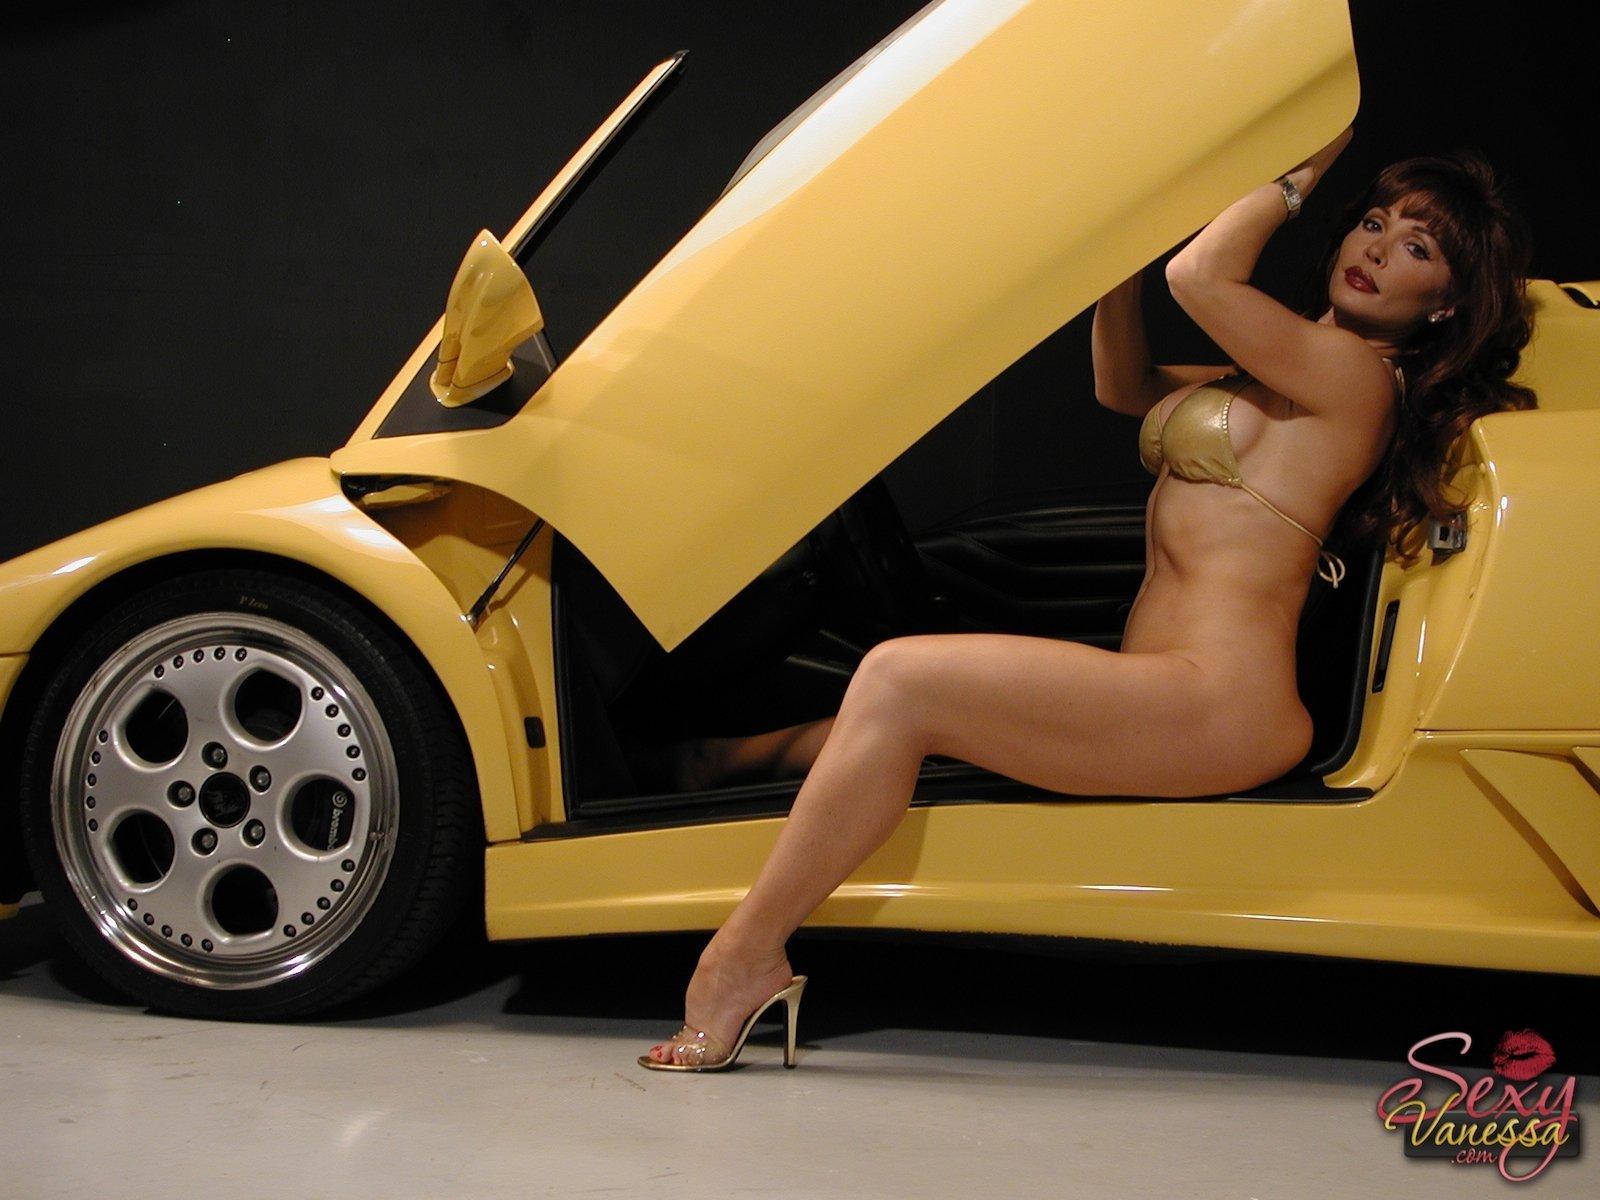 Girl Car Images, Stock Photos Vectors